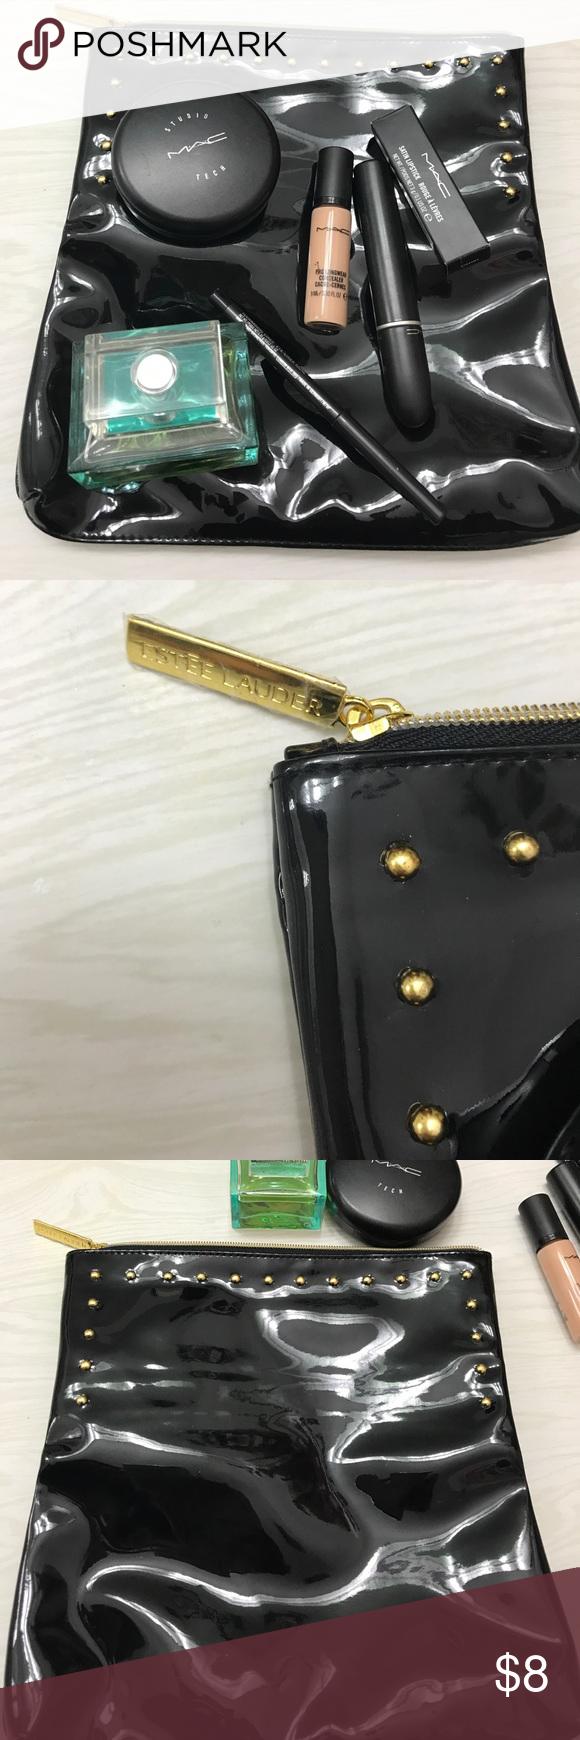 Estée Lauder makeup 💄 bag Makeup bag, Estee lauder